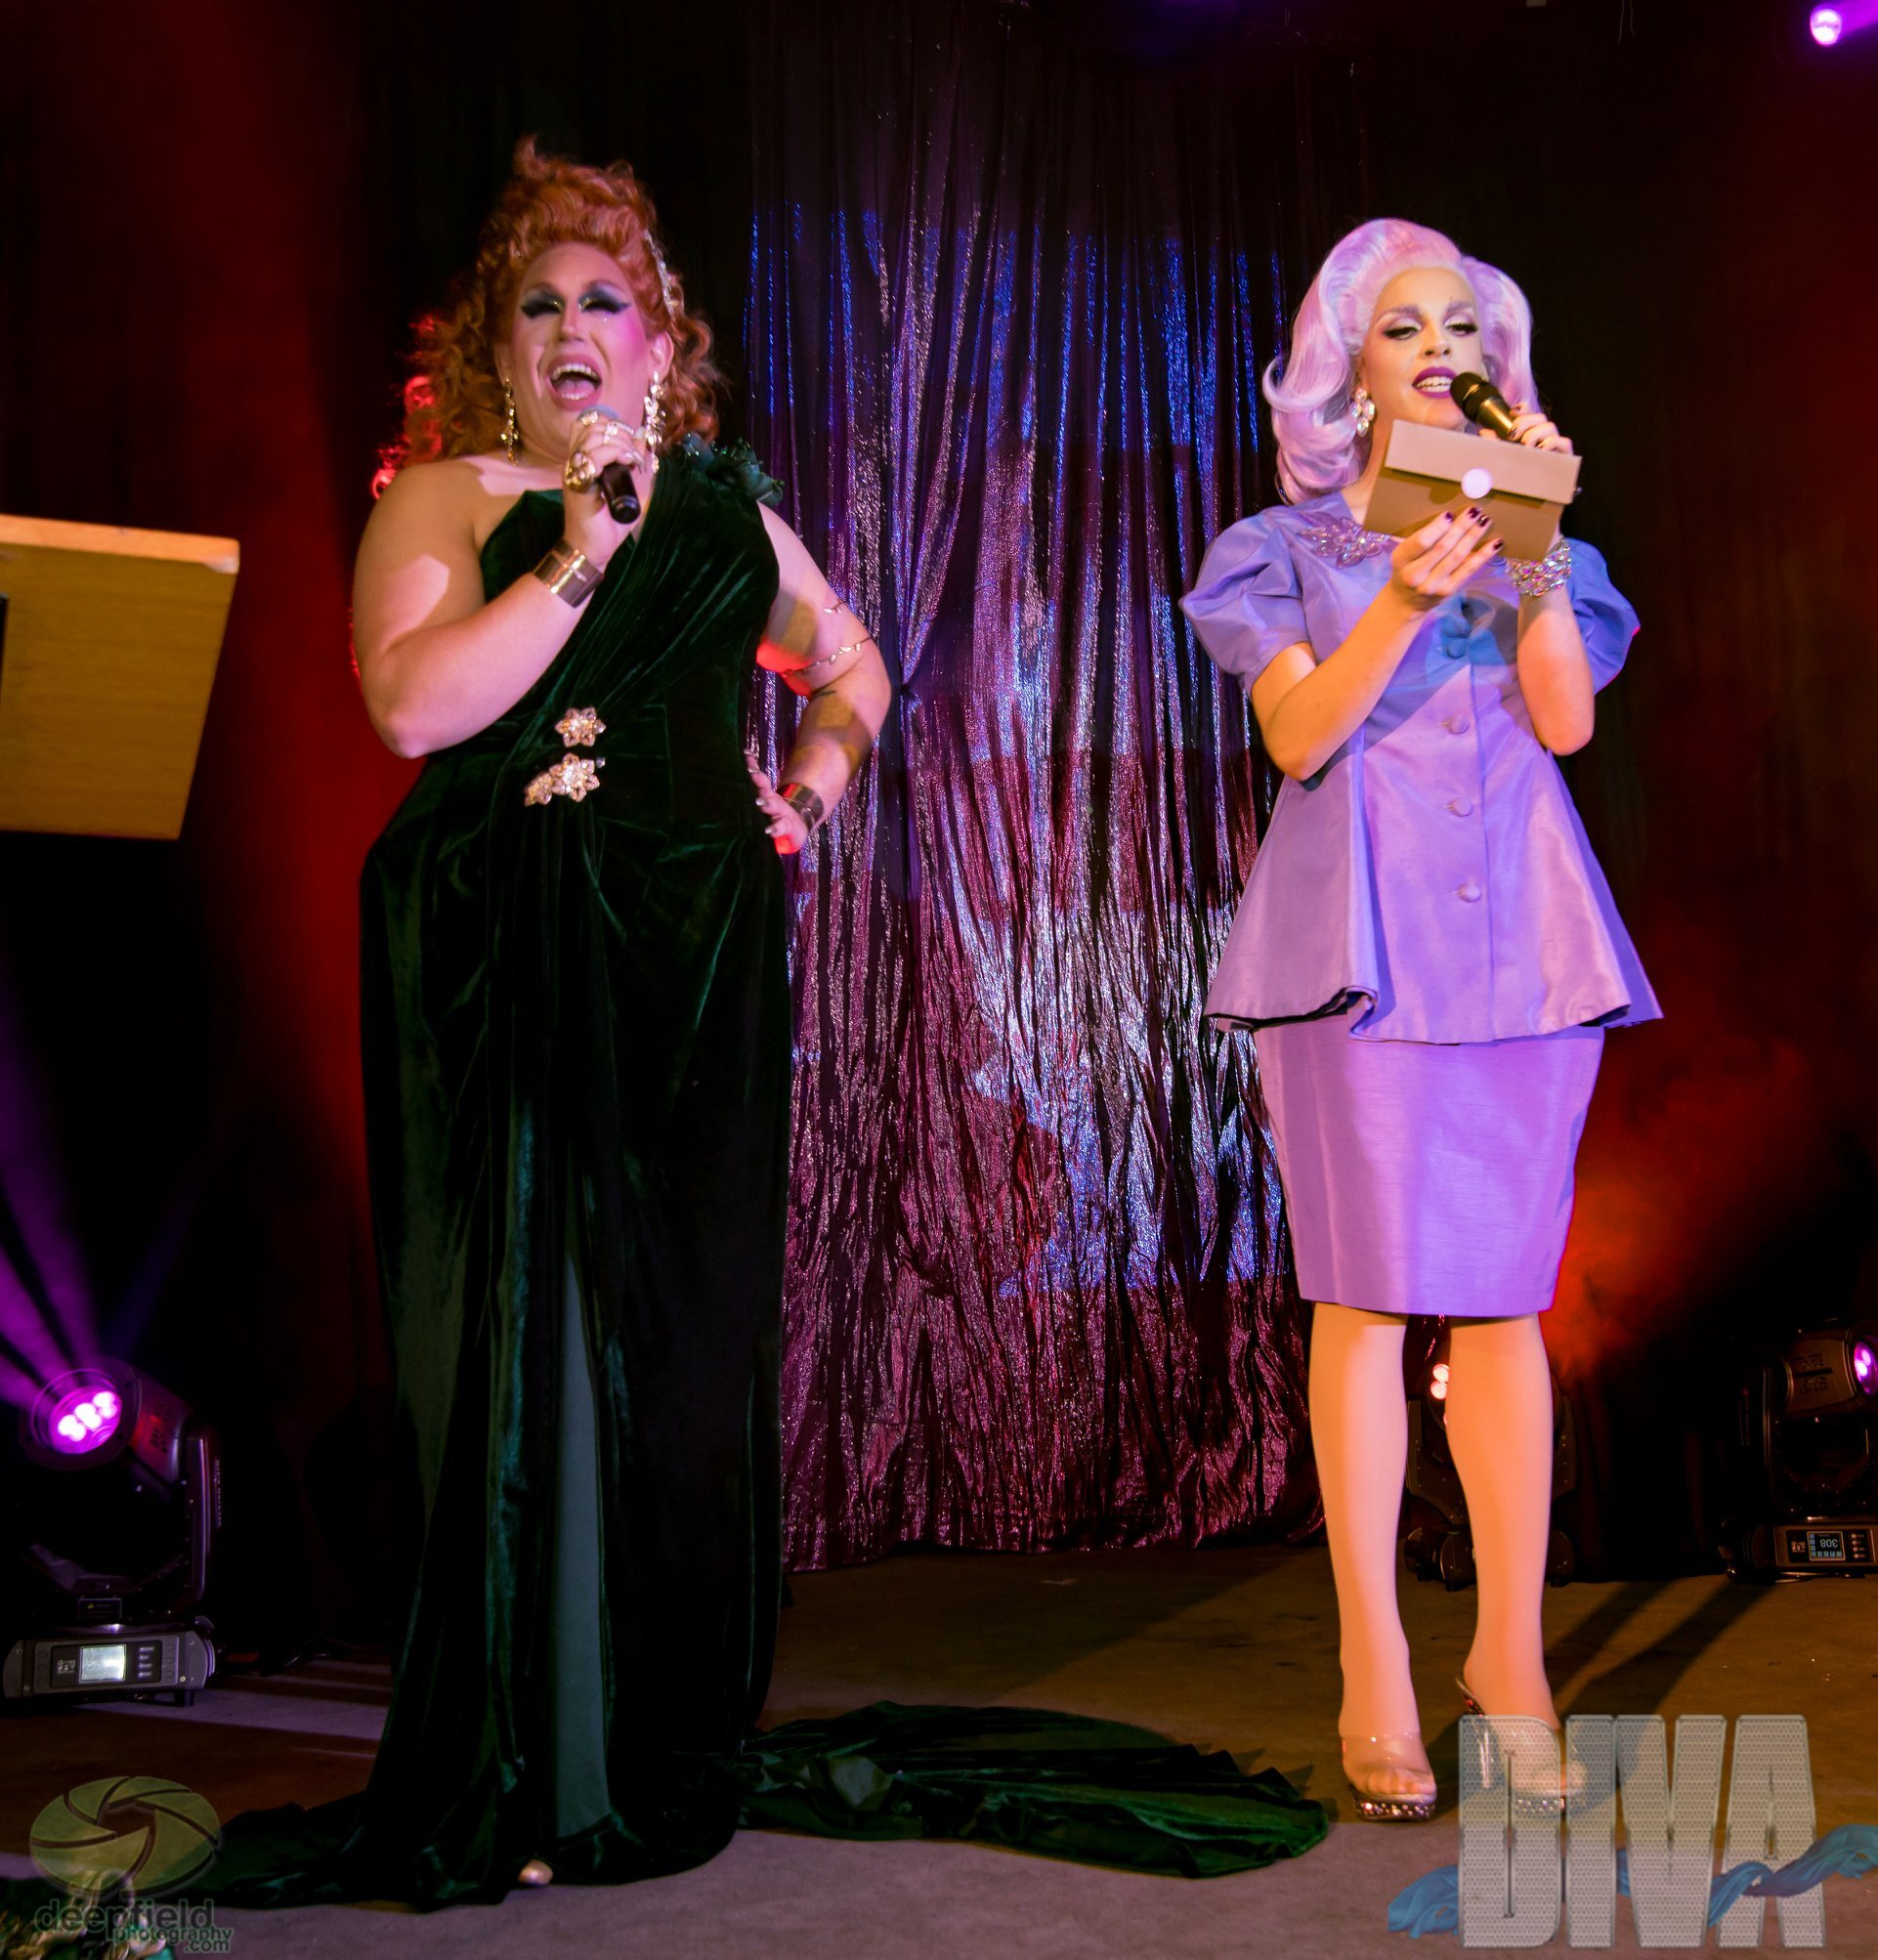 fran-giapanni-pomara-fifth-hosting--diva-awards-sydney-drag-queen-royalty-best-hire-drag-race-australia.jpg